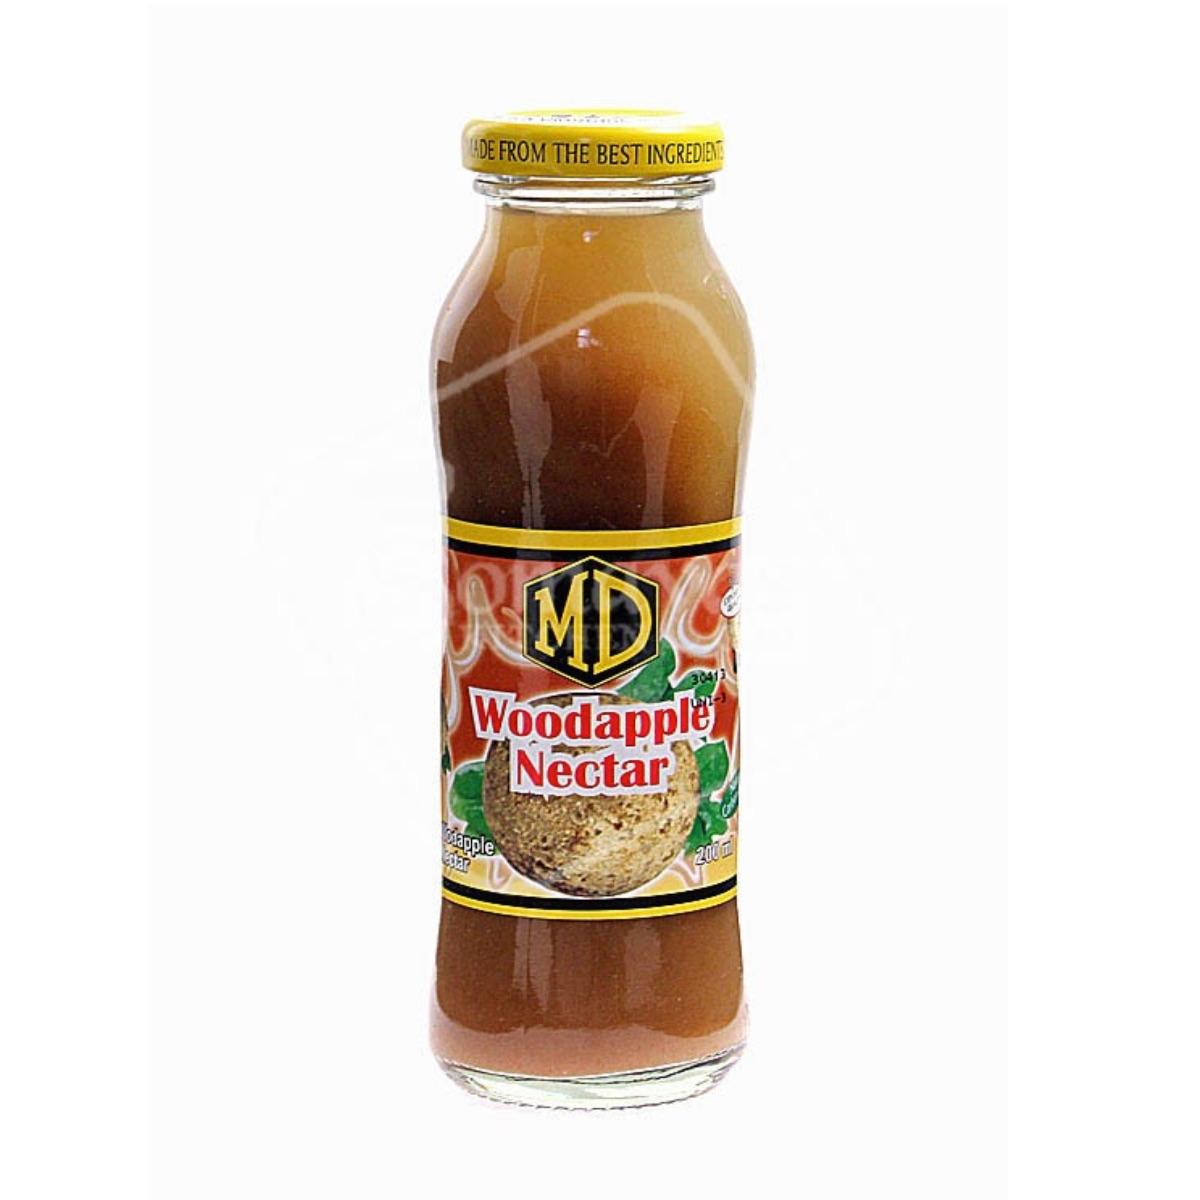 MD Woodapple Nectar 200ml - £0.99